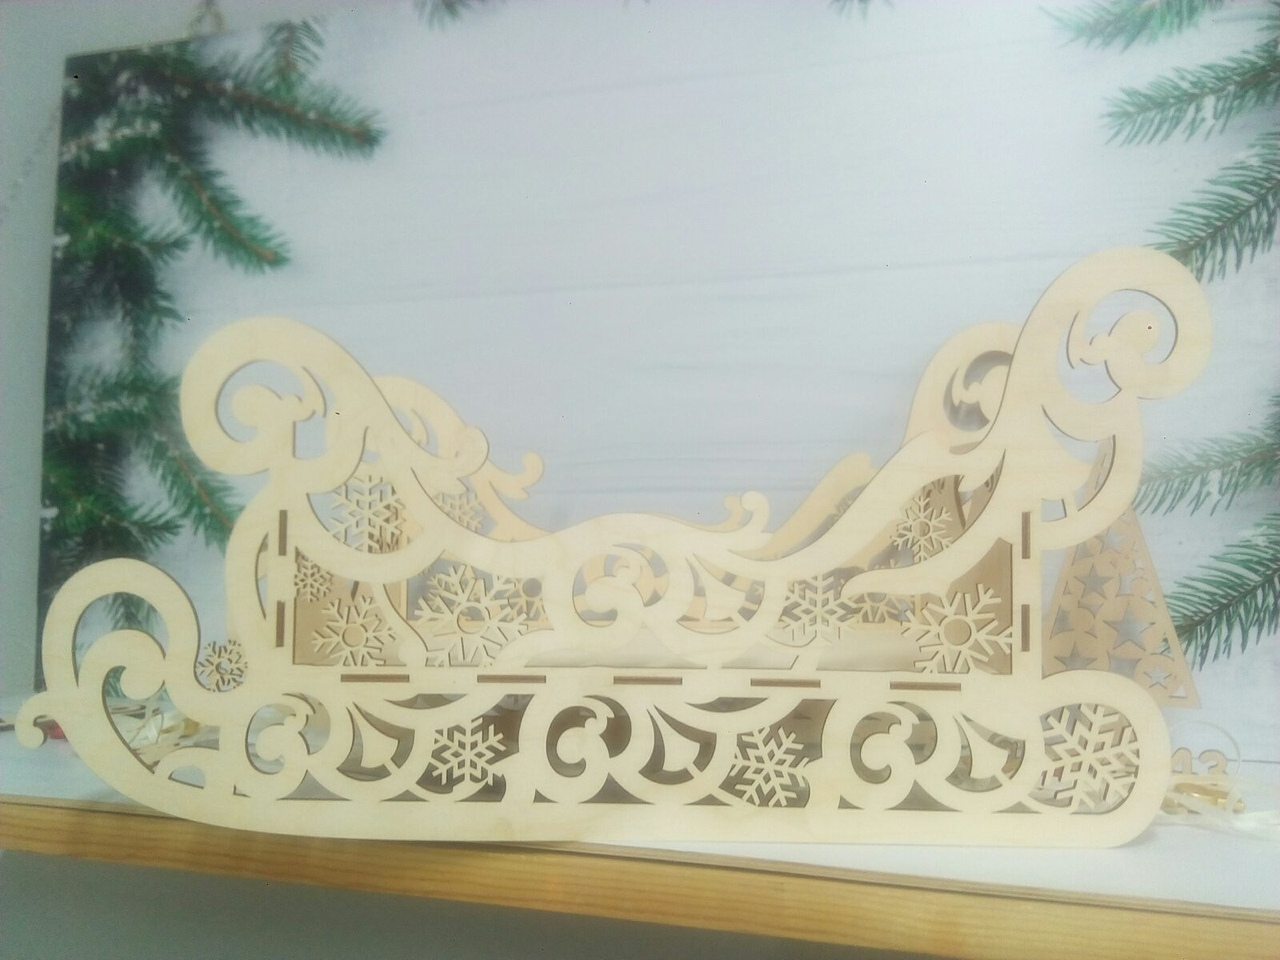 Wooden Decorative Sleigh Laser Cutting Template Free CDR Vectors Art